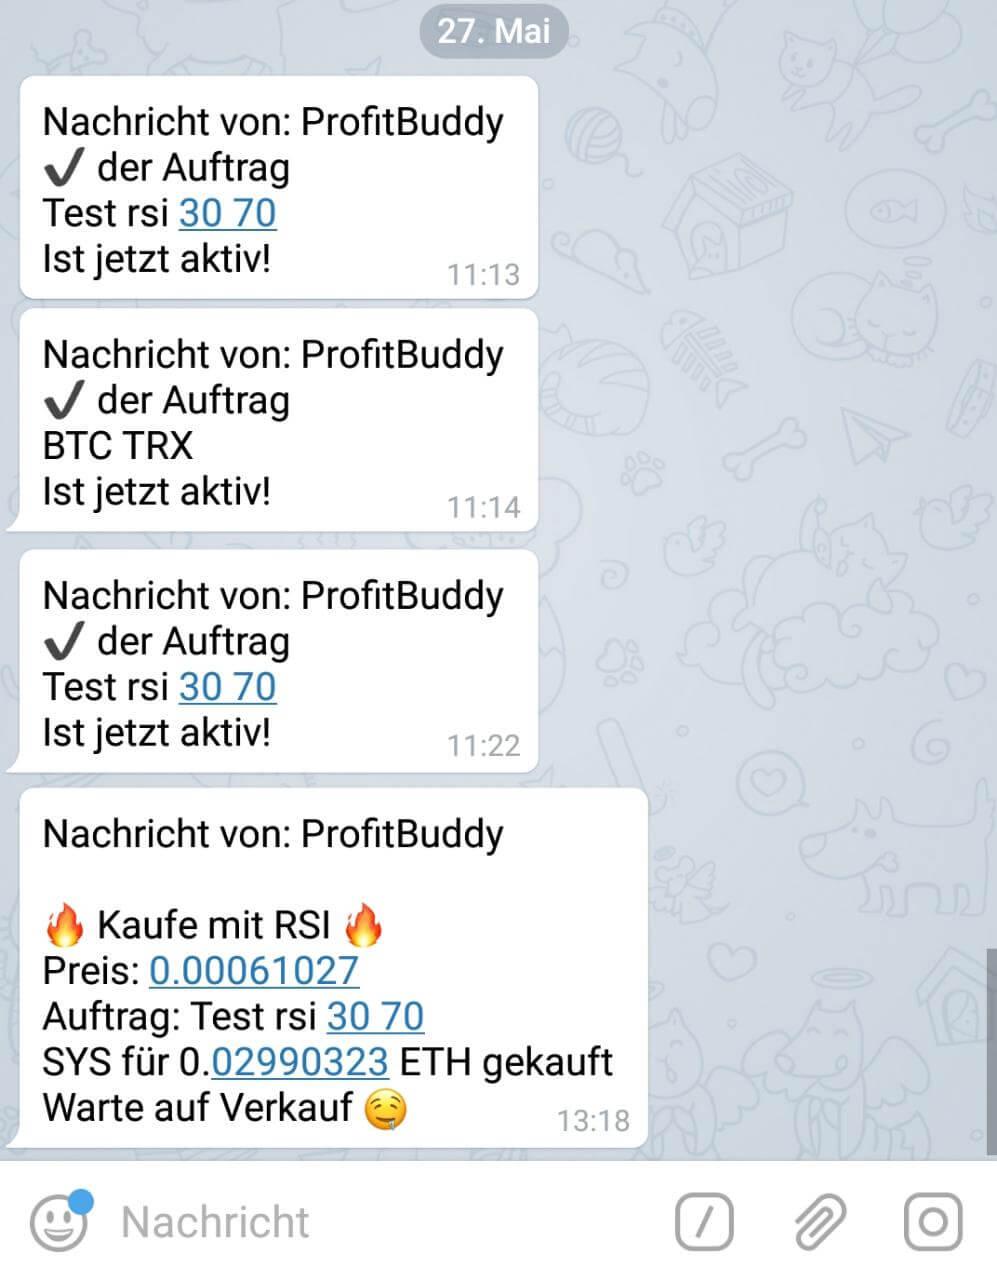 ProfitBuddy Rendite, ProfitBuddy Review, ProfitBuddy scam, ProfitBuddy Schneeballsystem, ProfitBuddy seriös, ProfitBuddy sicher, ProfitBuddy Test, ProfitBuddy Trading Bot